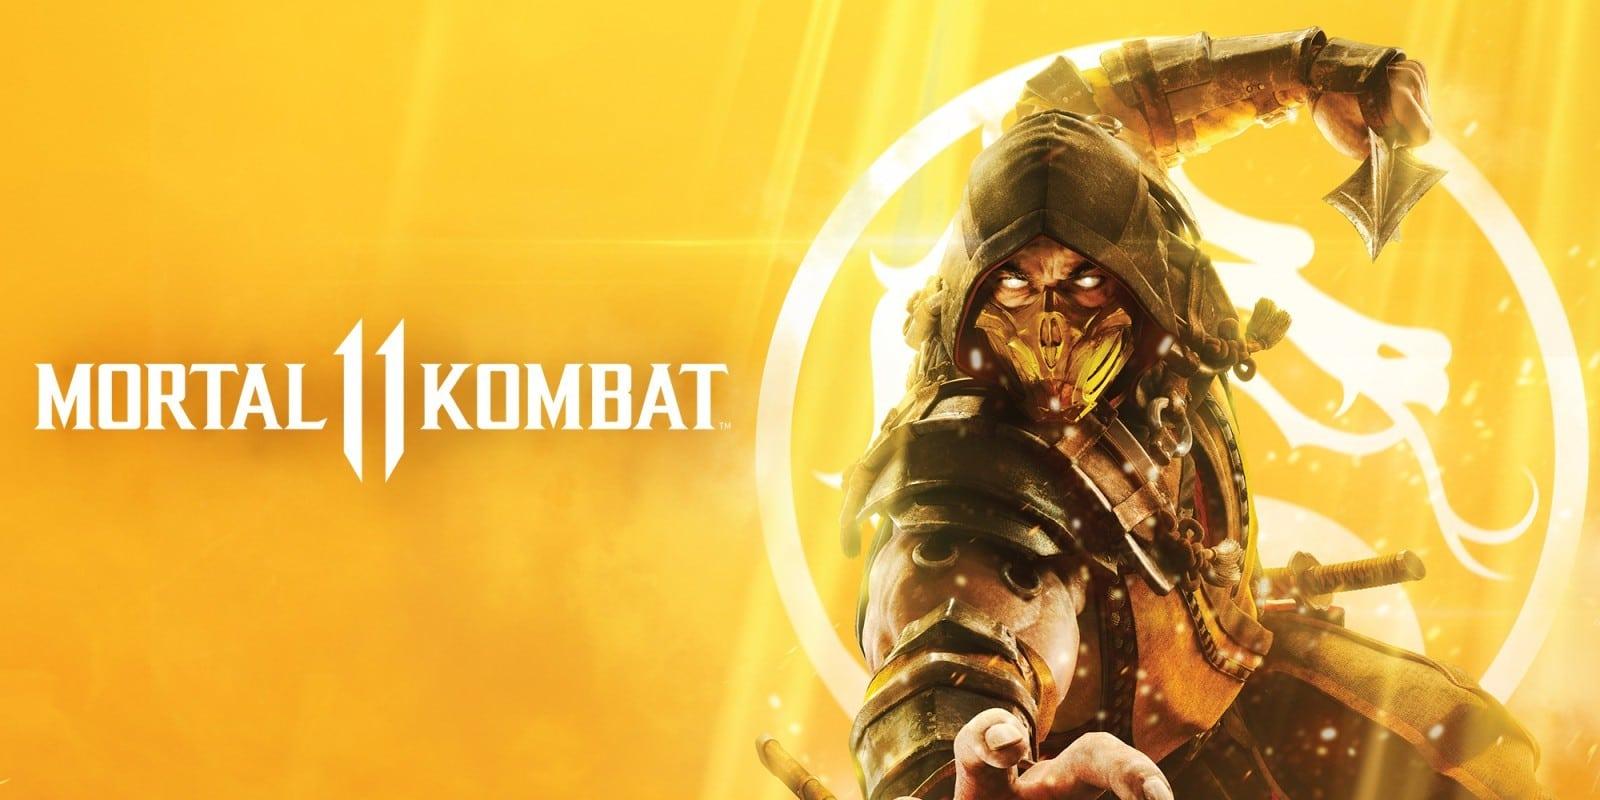 Scorpion e o logo de Mortal Kombat 11